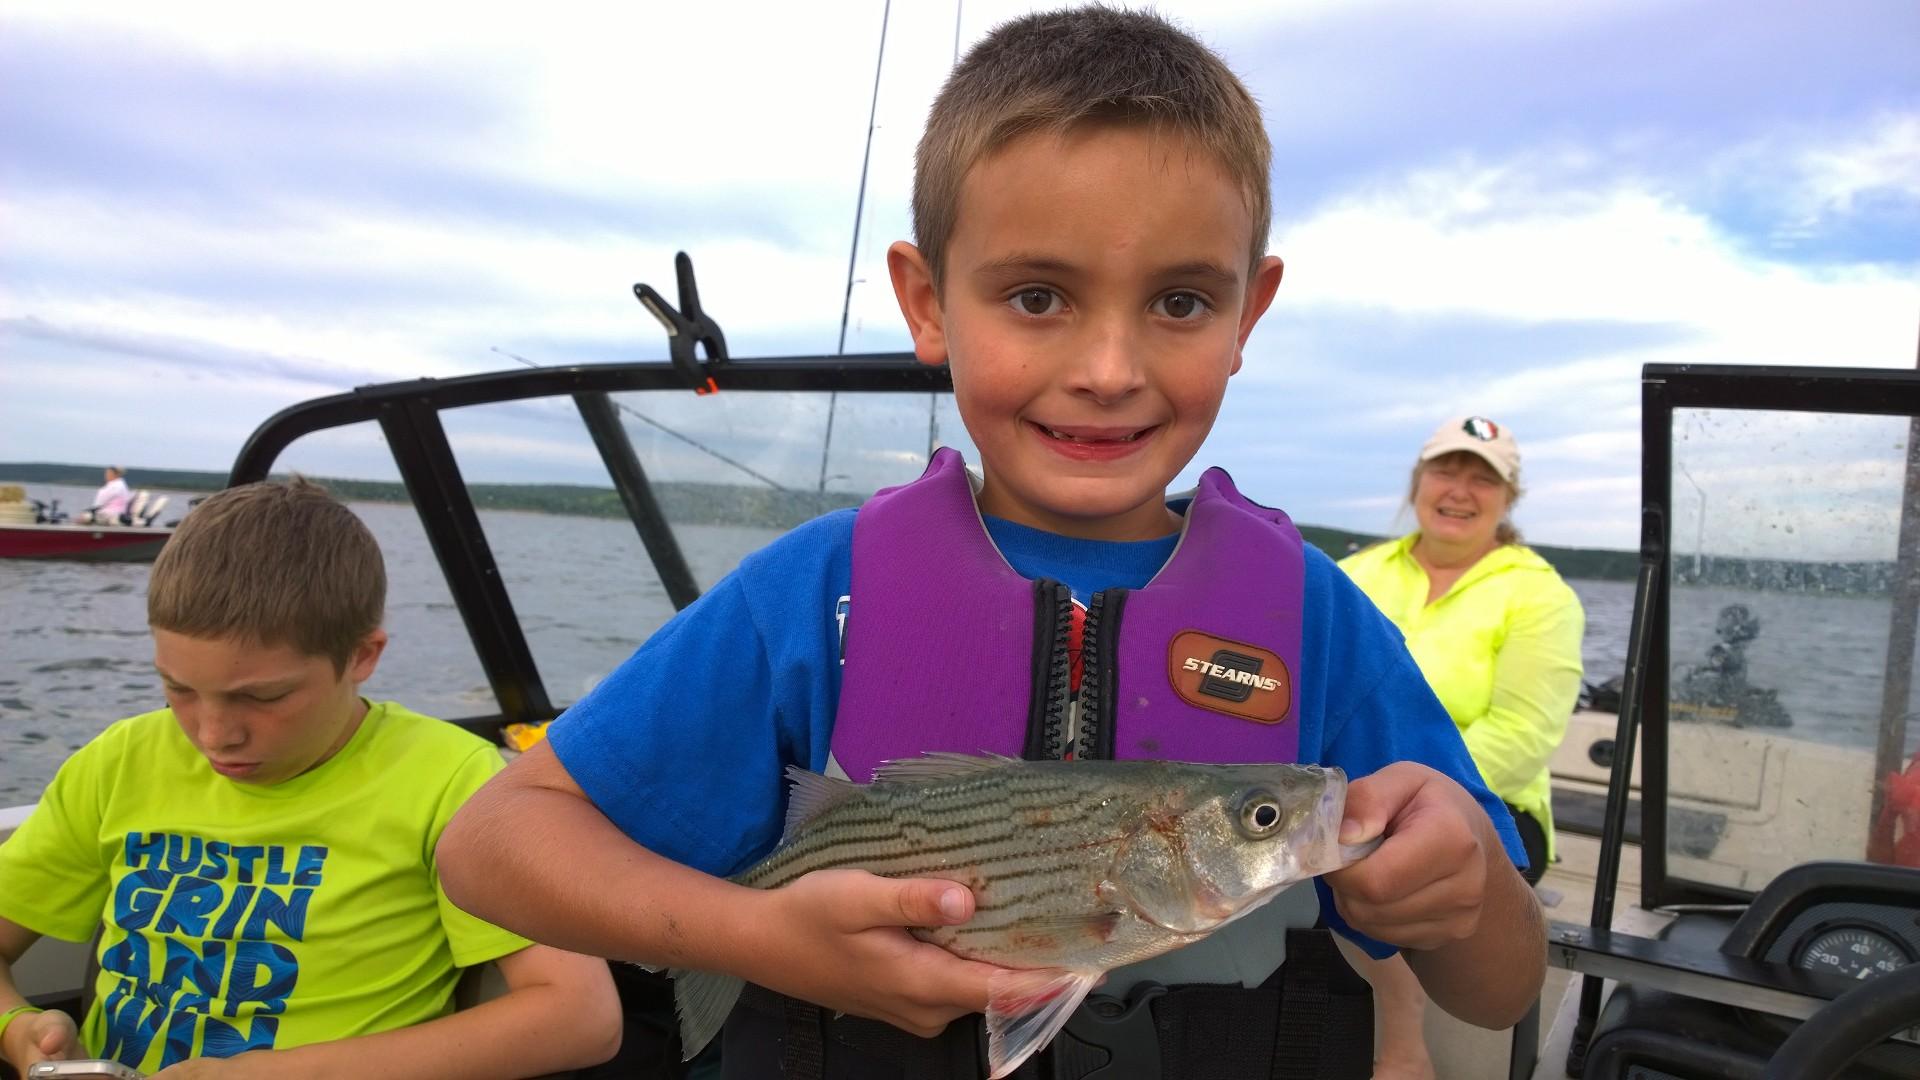 June 8th skiatook lake fishing for hybrid striper pray for Skiatook lake fishing report